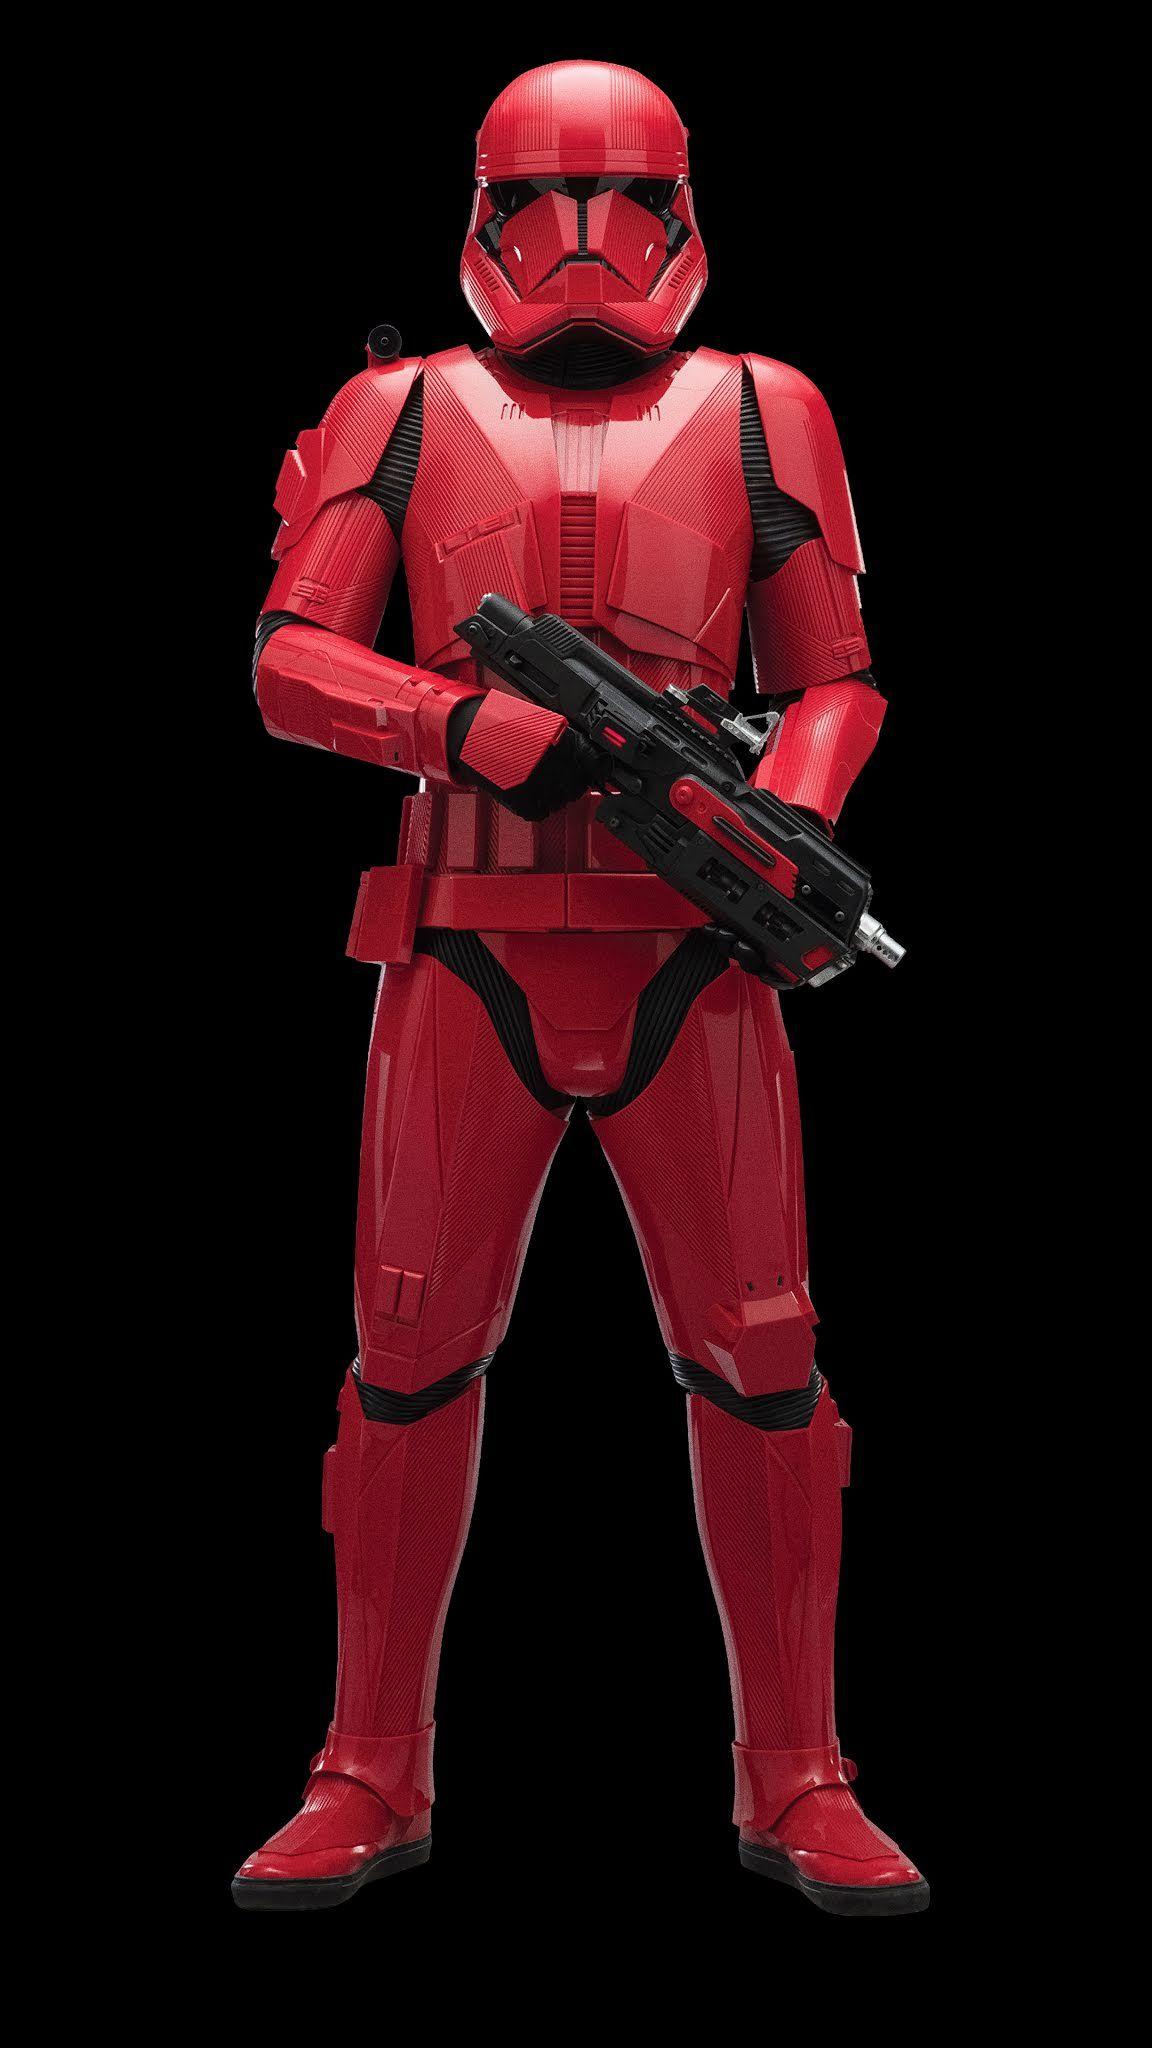 Sith Trooper Star Wars The Rise Of Skywalke 2019 Mobile Wallpaper In 2020 Star Wars Sith Star Wars Art Star Wars Trooper